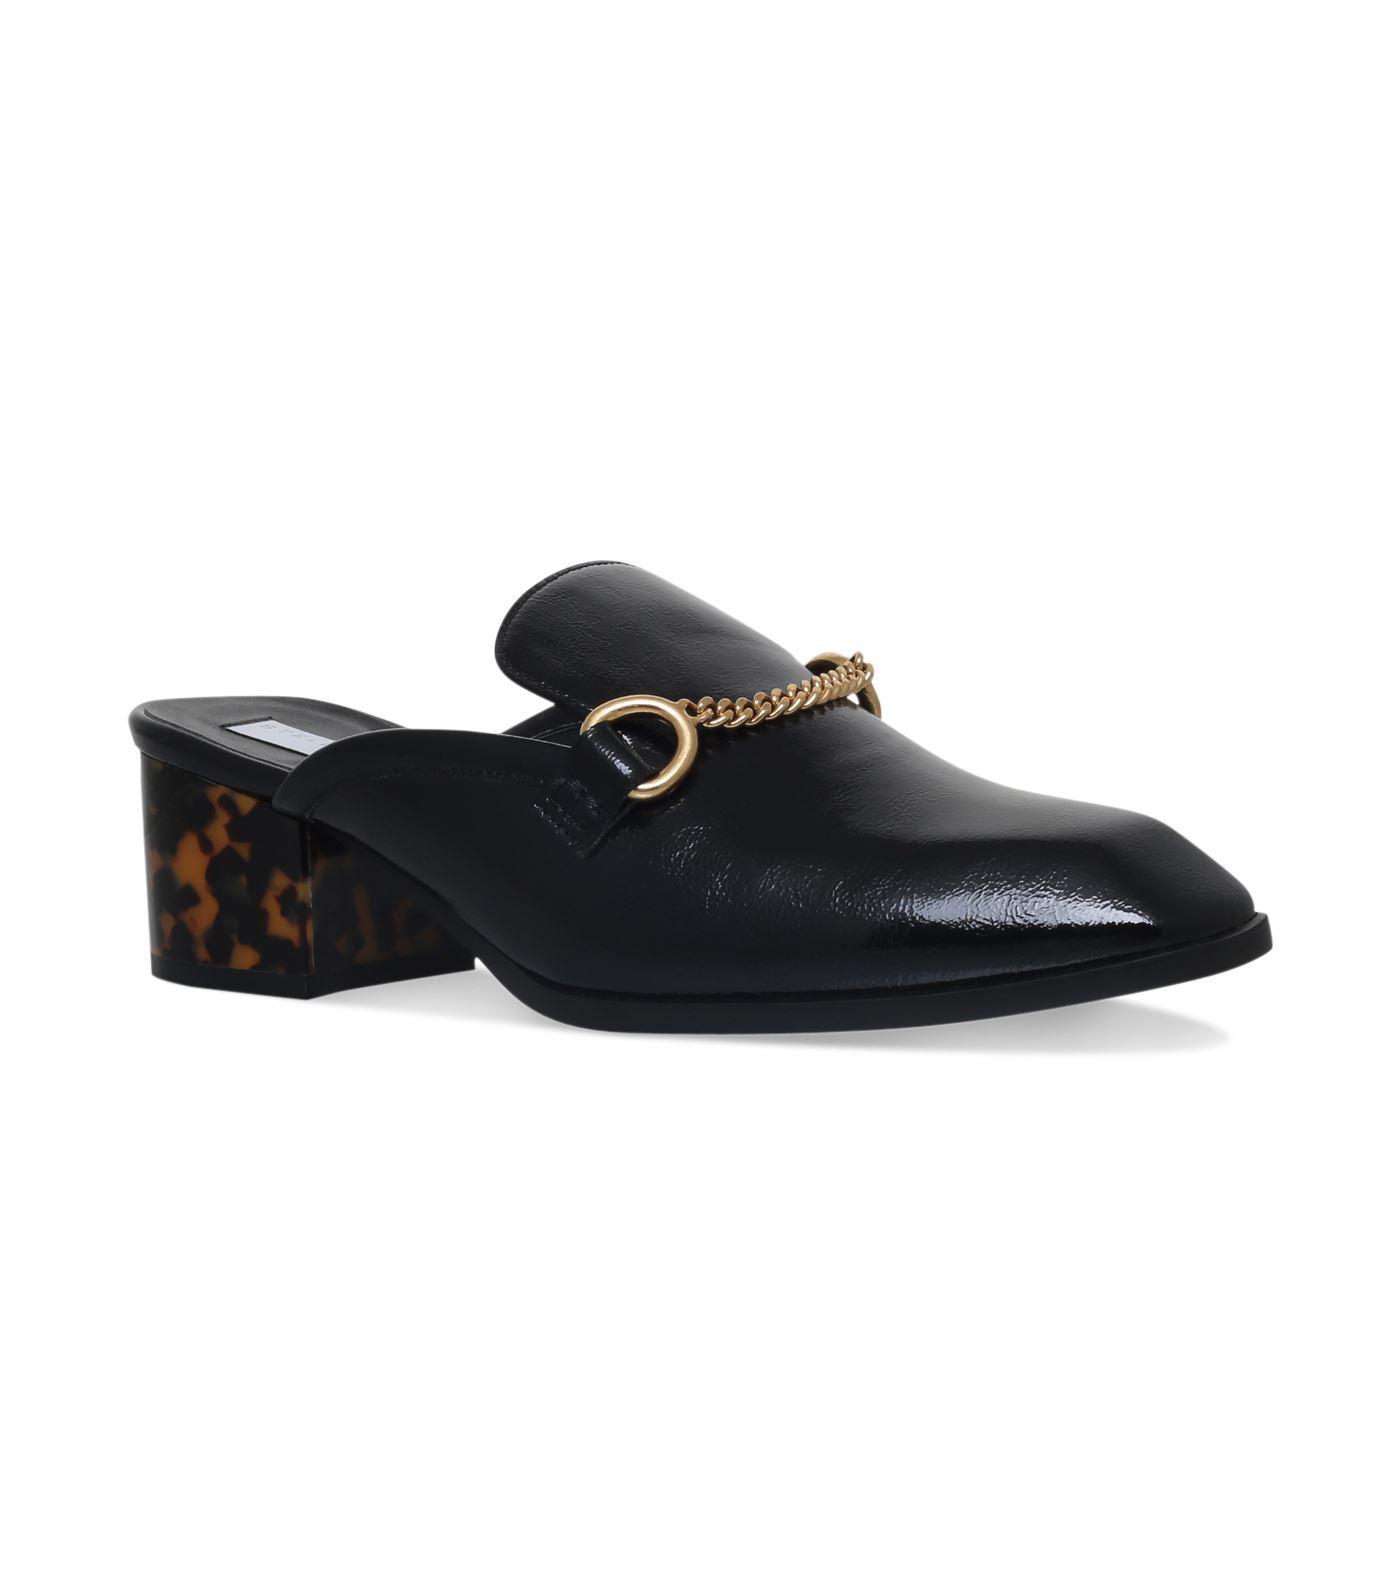 Stella McCartney Black Princetown Slip-On Loafers EsQ1IBI